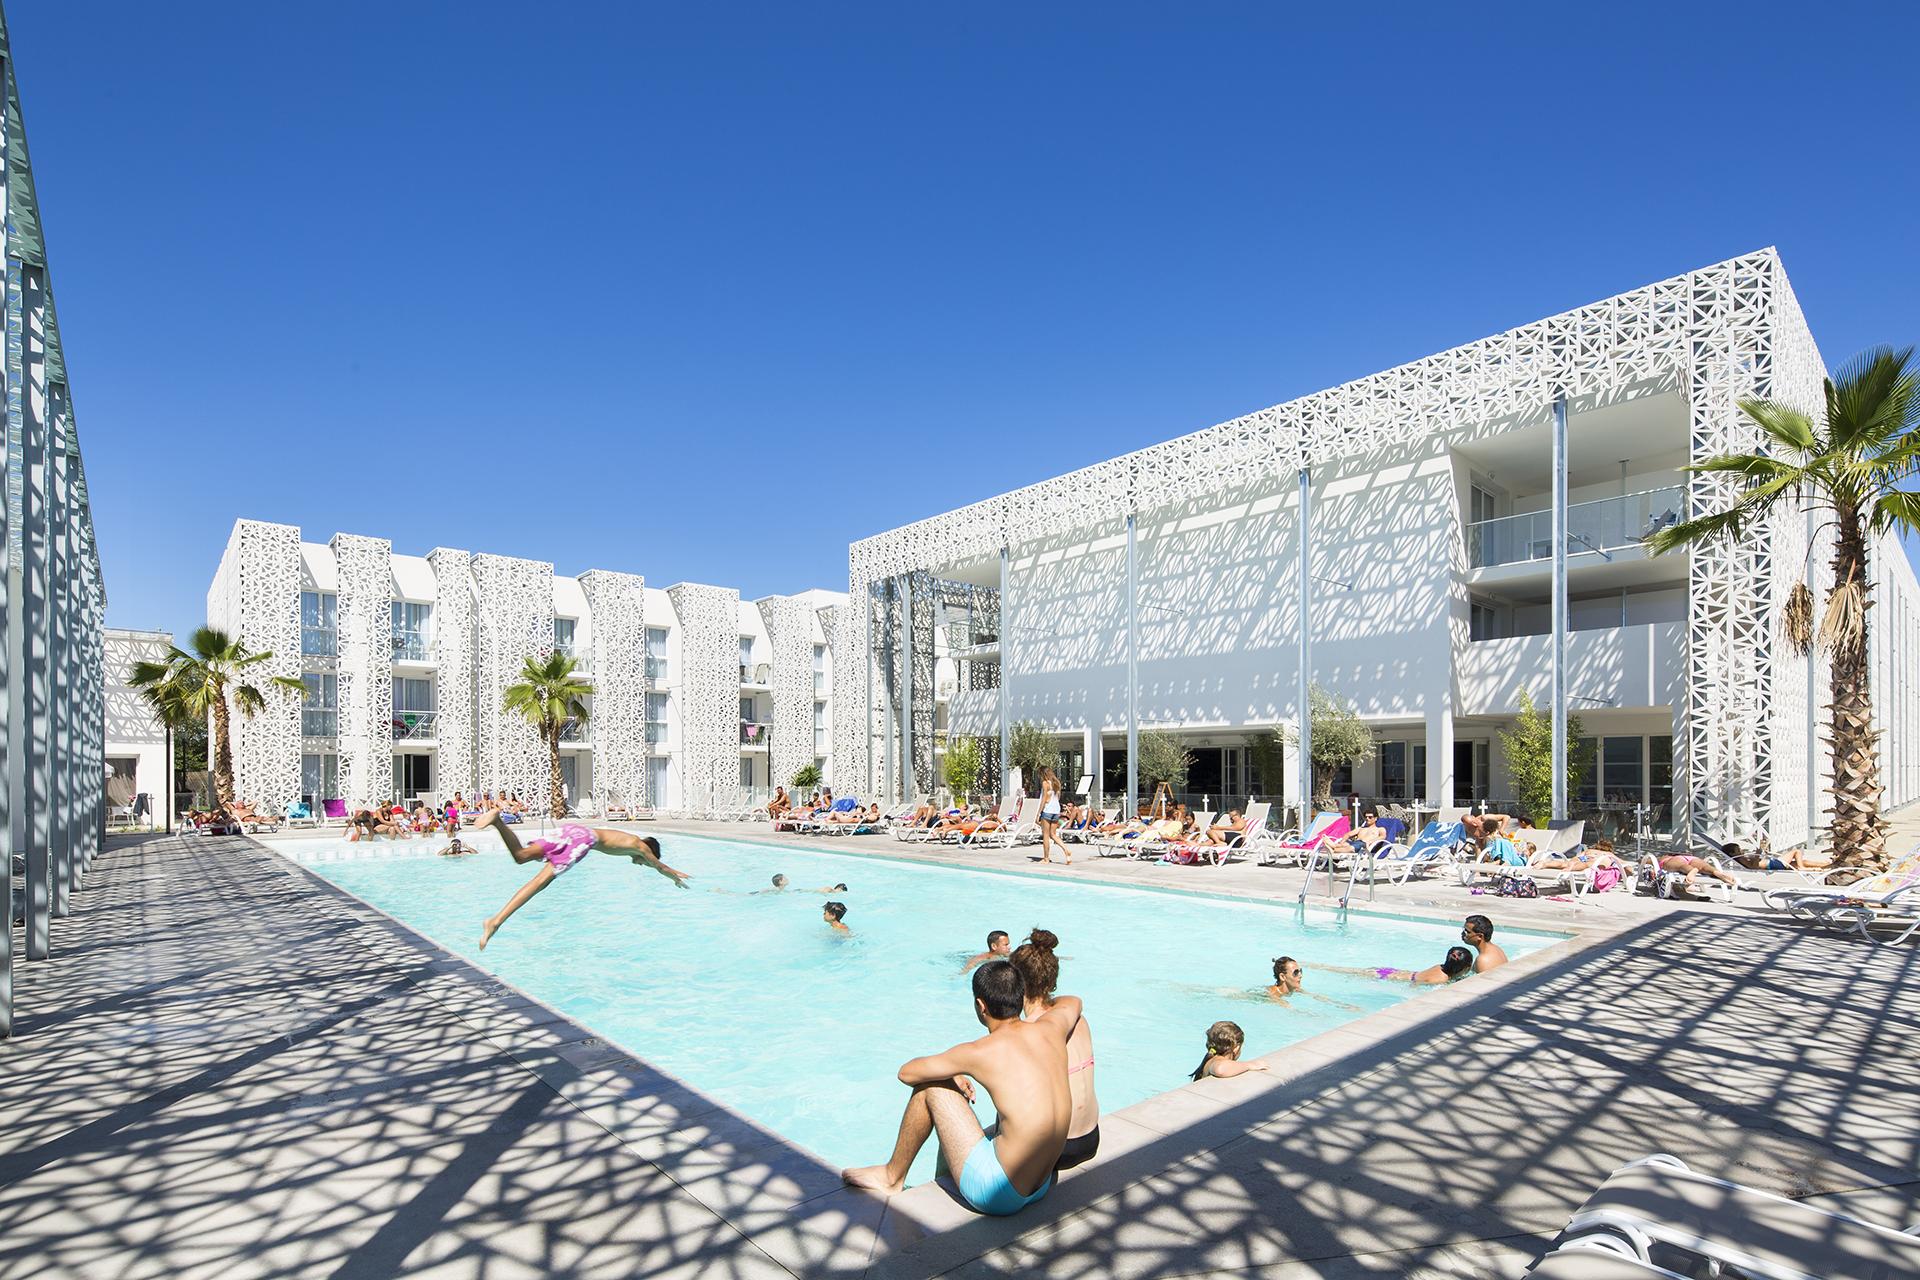 Hotel Cap dAgde | Architect Magazine | Jacques Ferrier Architecture, Agde, FRANCE, Hospitality